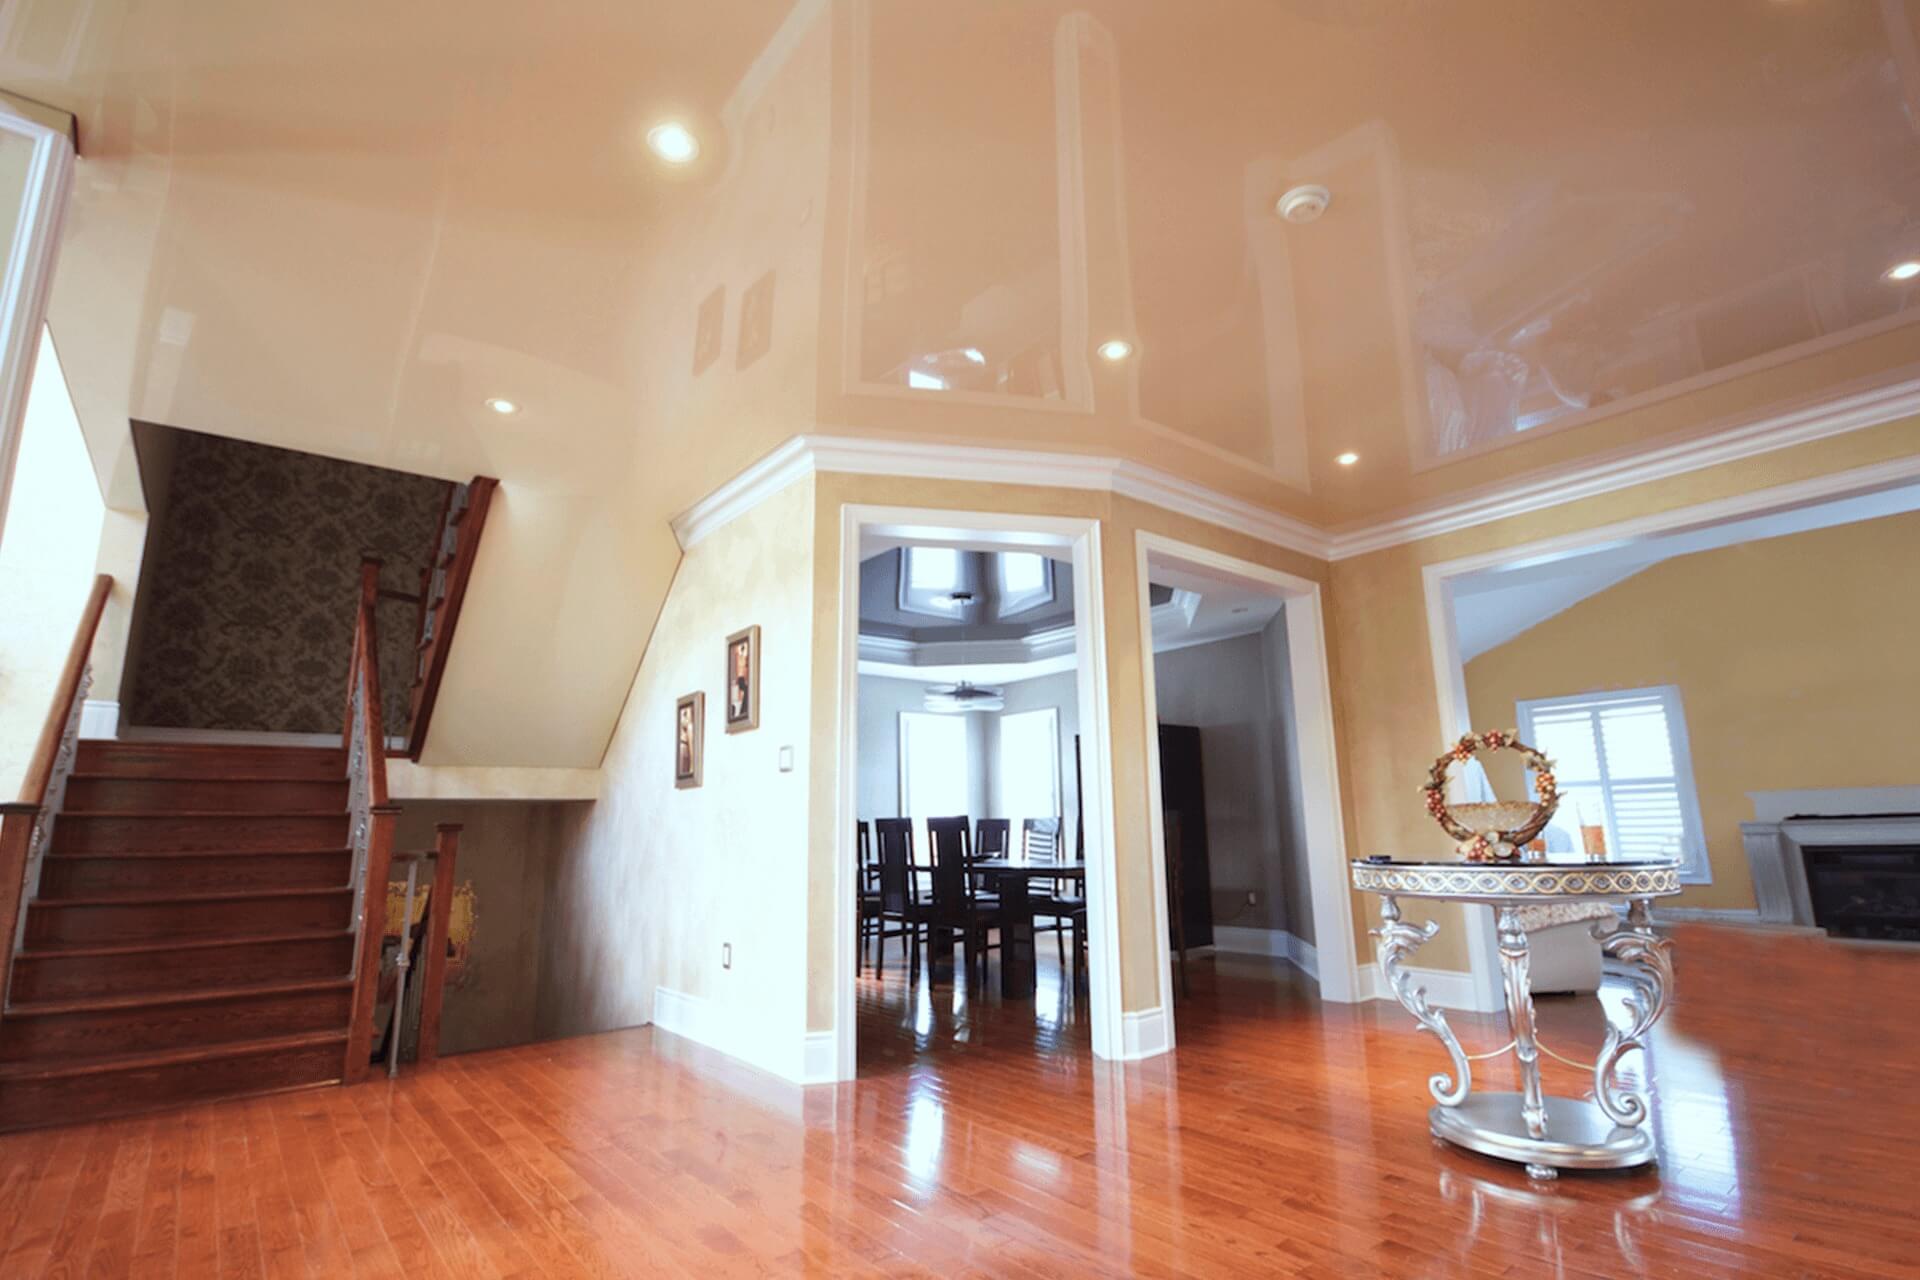 глянцевые потолки в доме